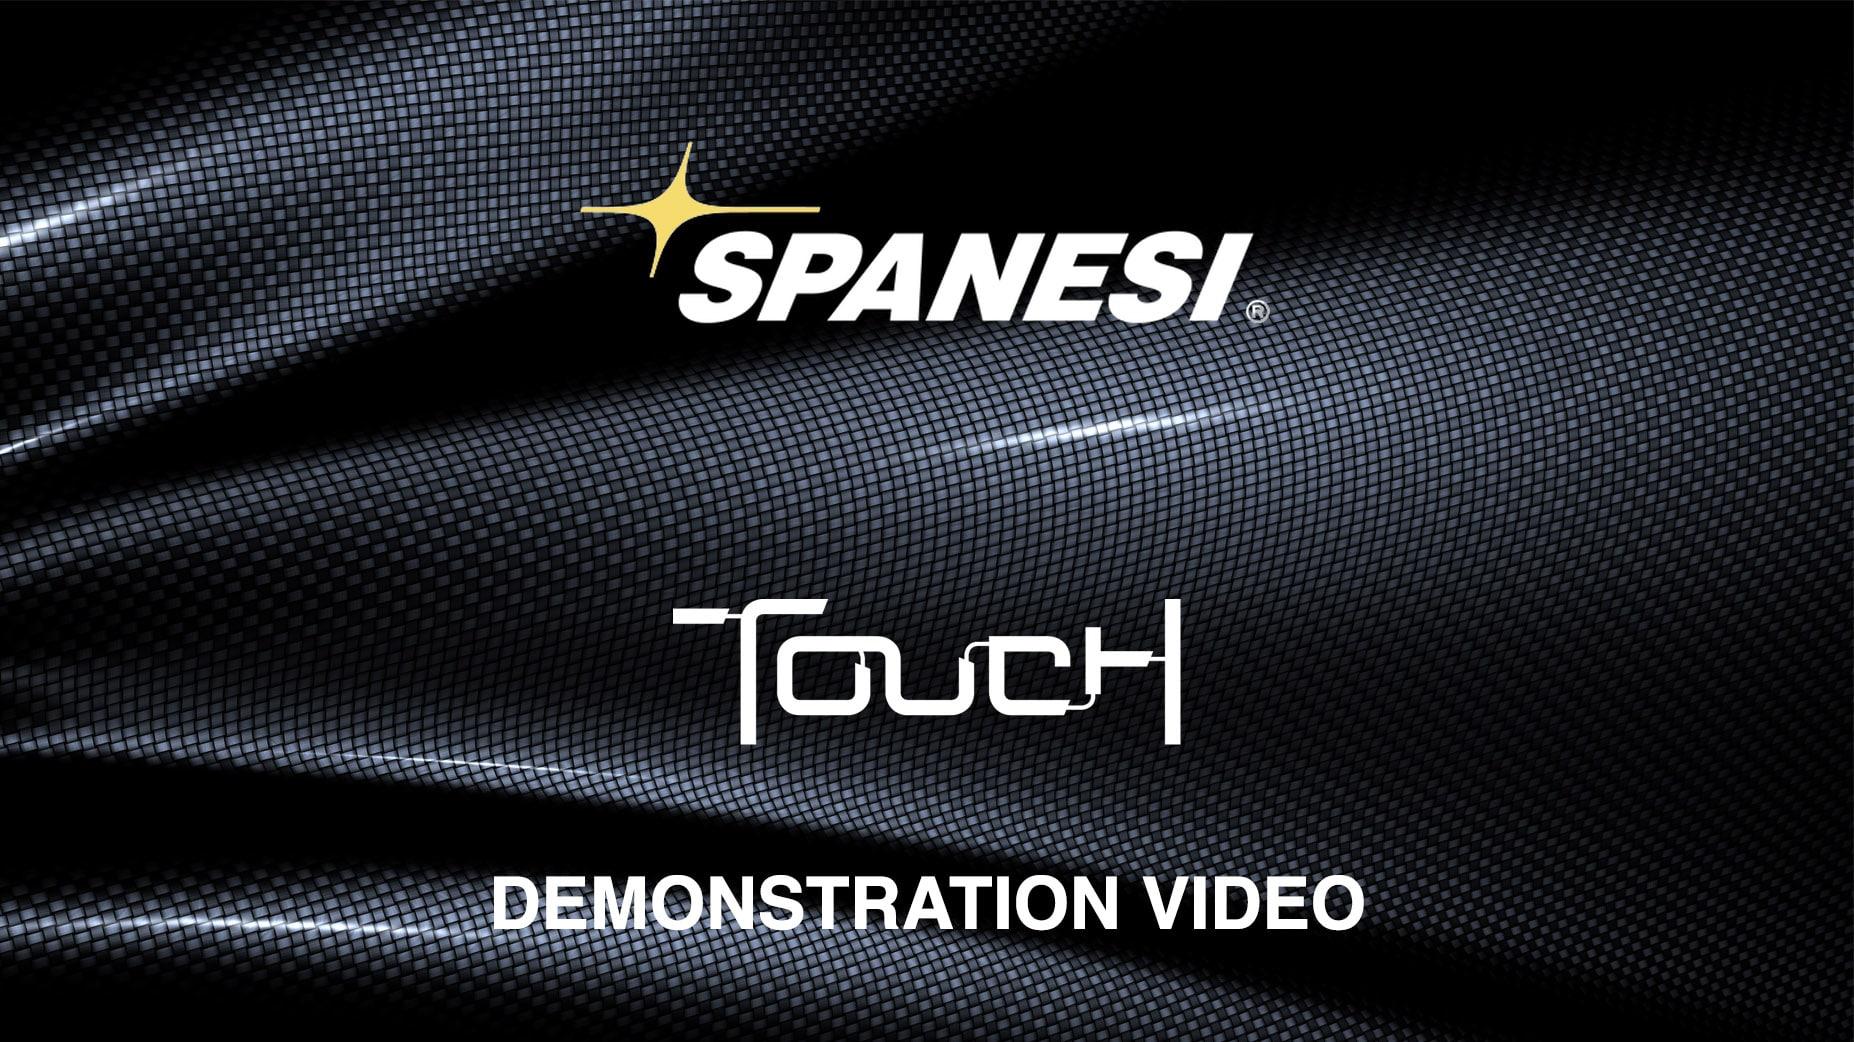 Spanesi-Touch Video